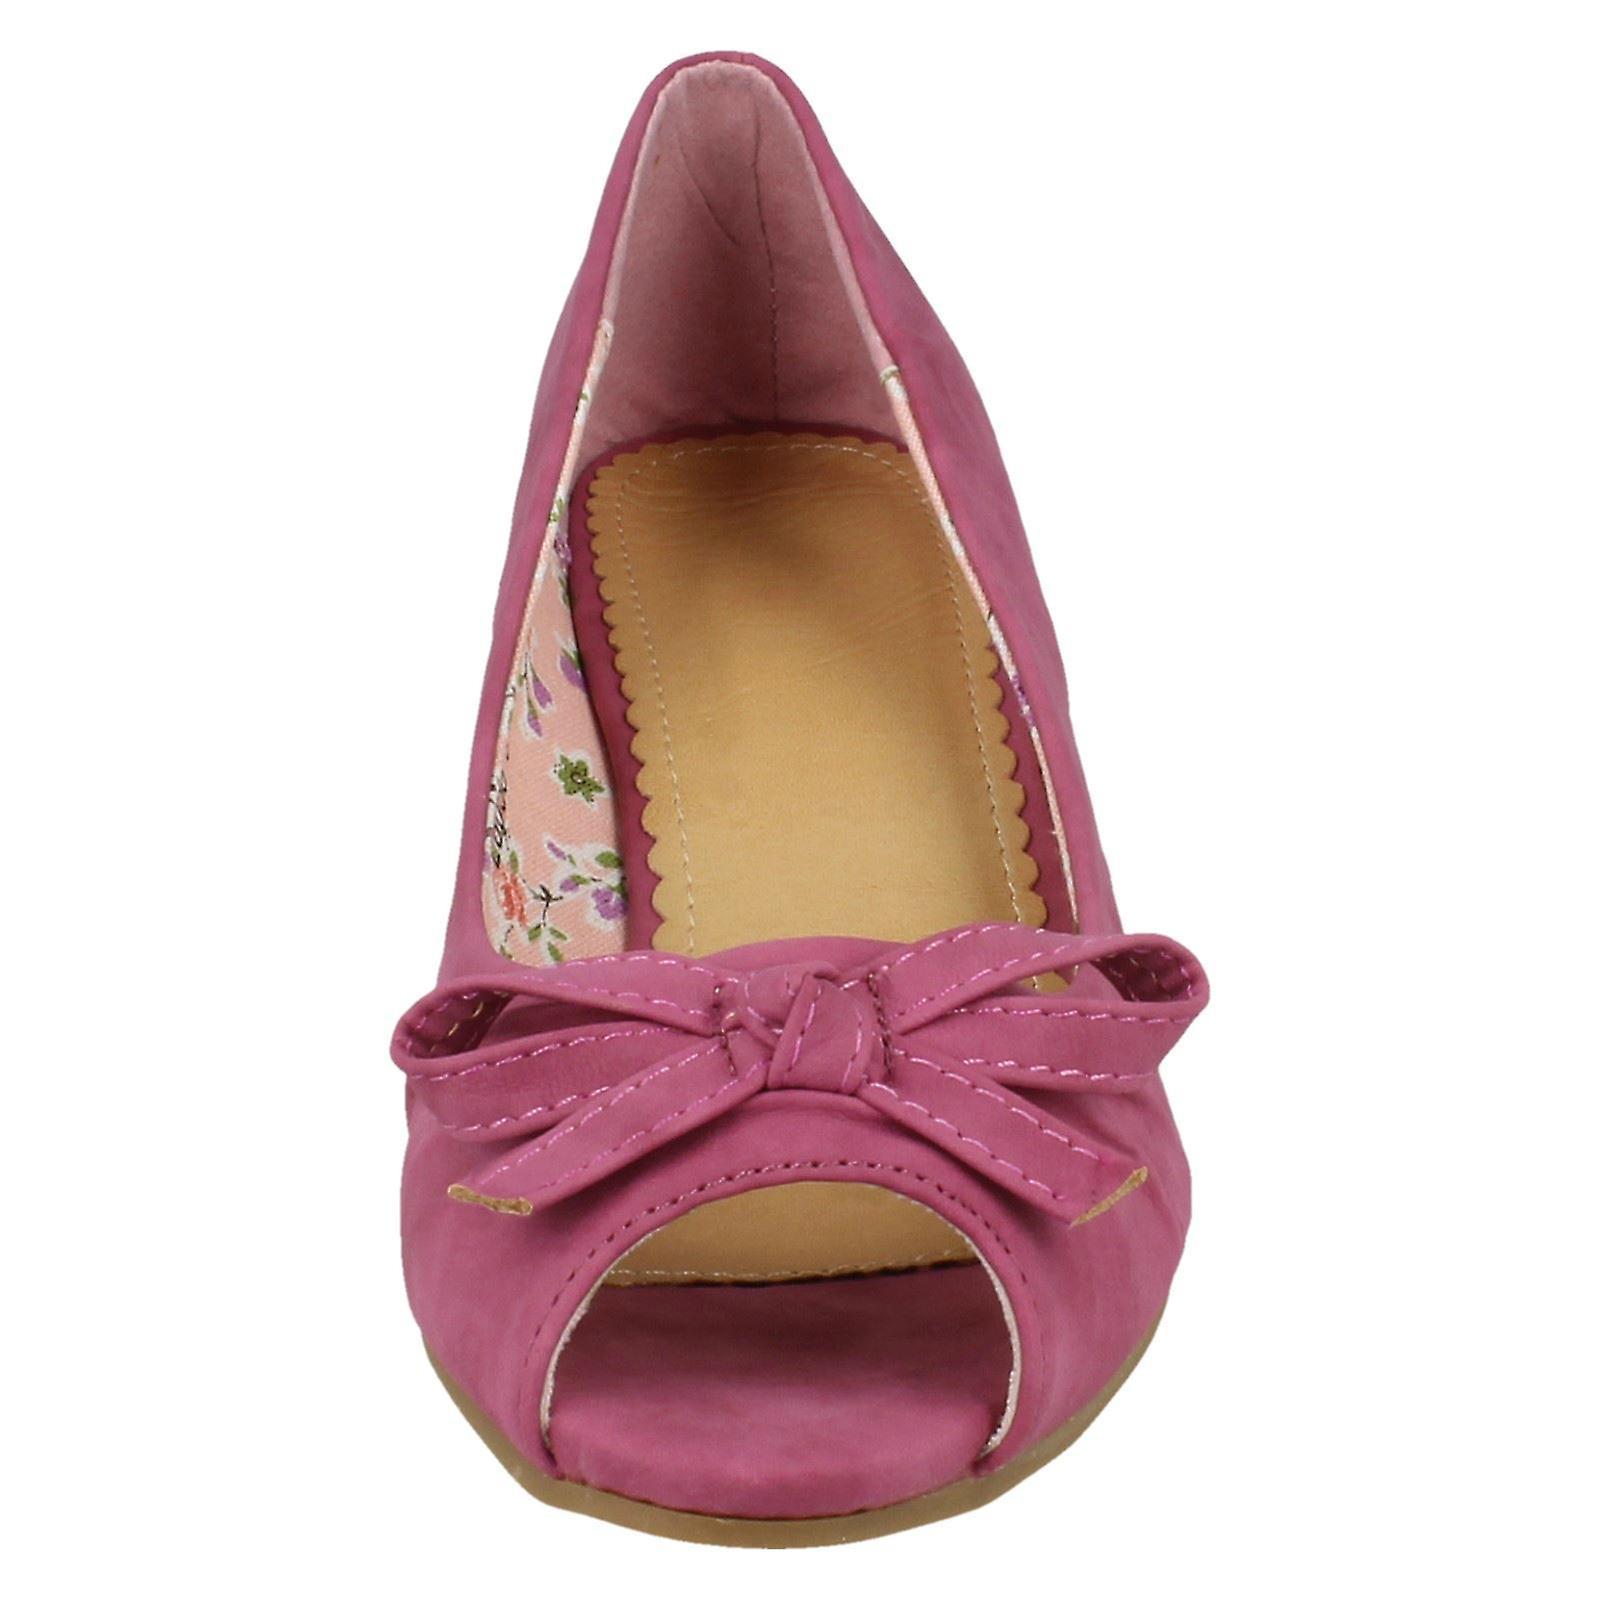 Buty Damskie Savannah Mały Klin